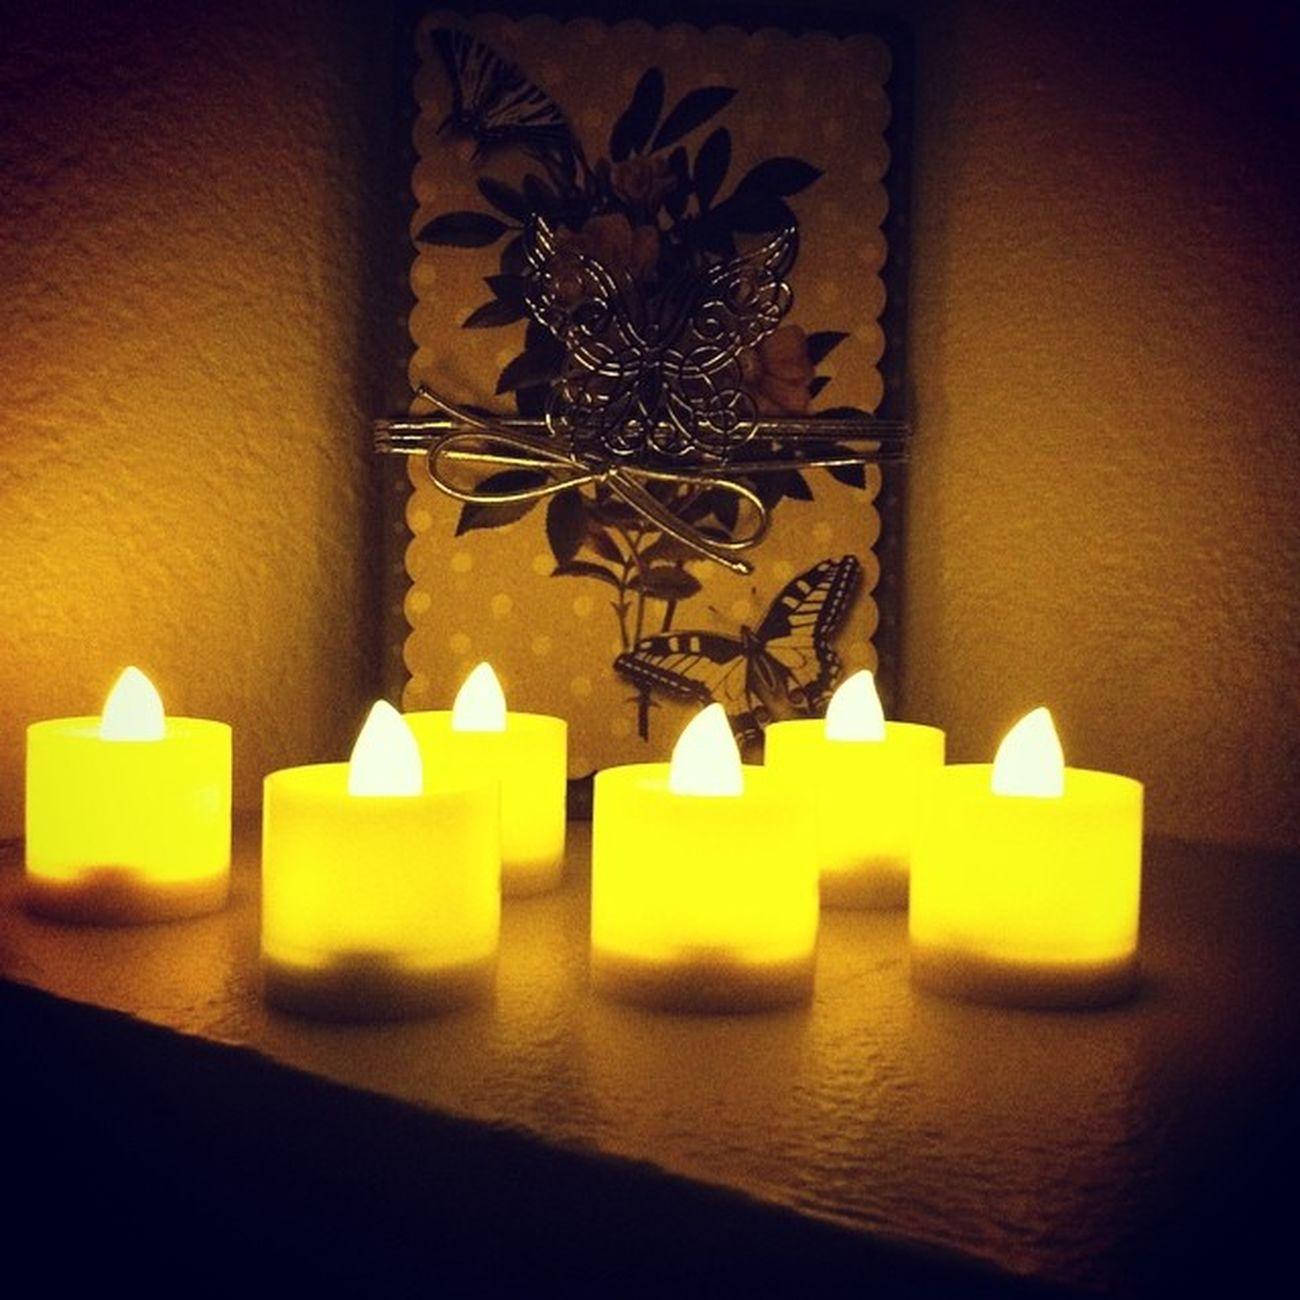 Its time to put my mind to rest Meditation Relaxedmindbodyandspirit Namaste